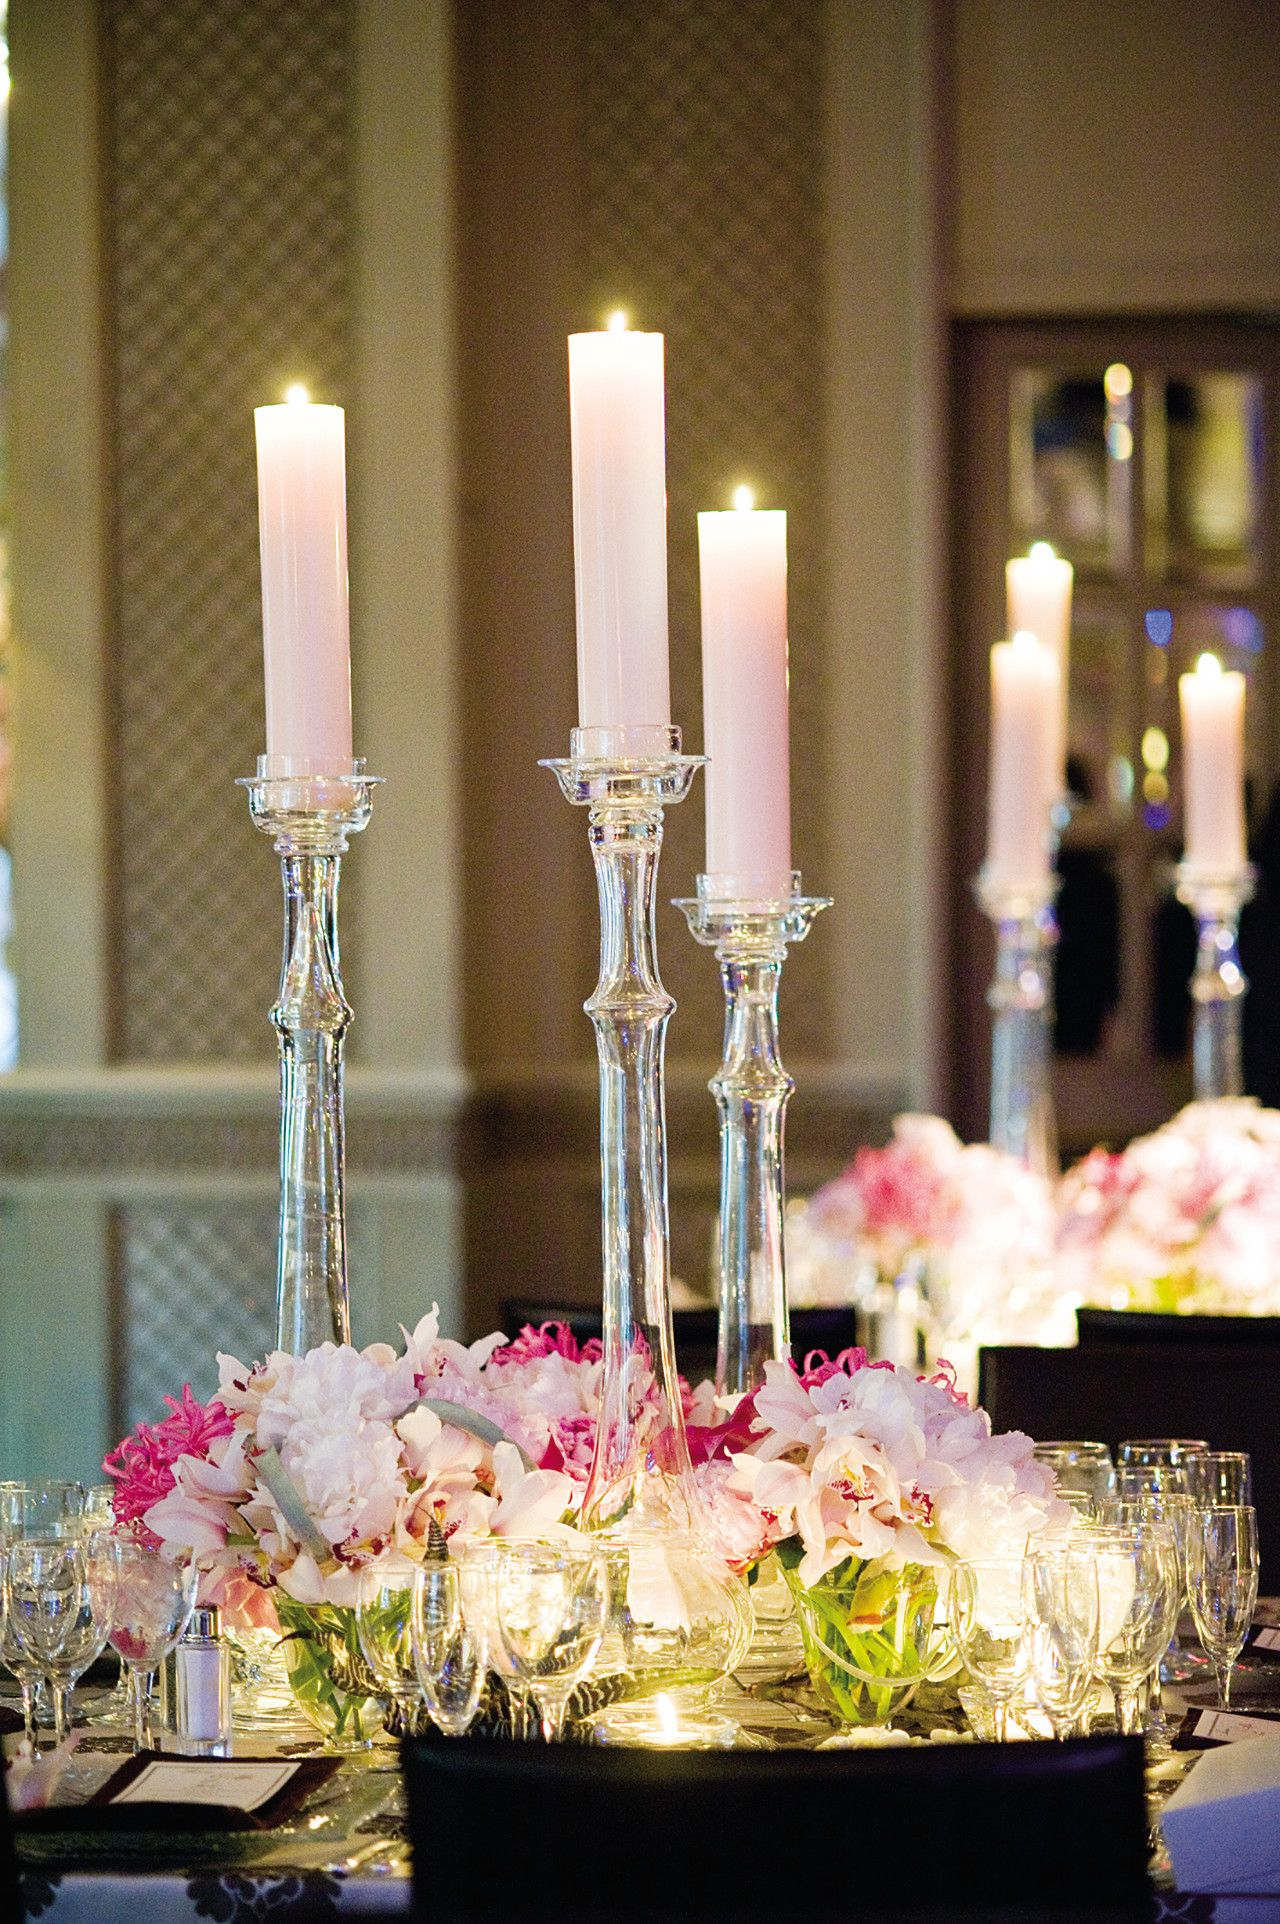 Tall translucent candlesticks add a delightfully modern